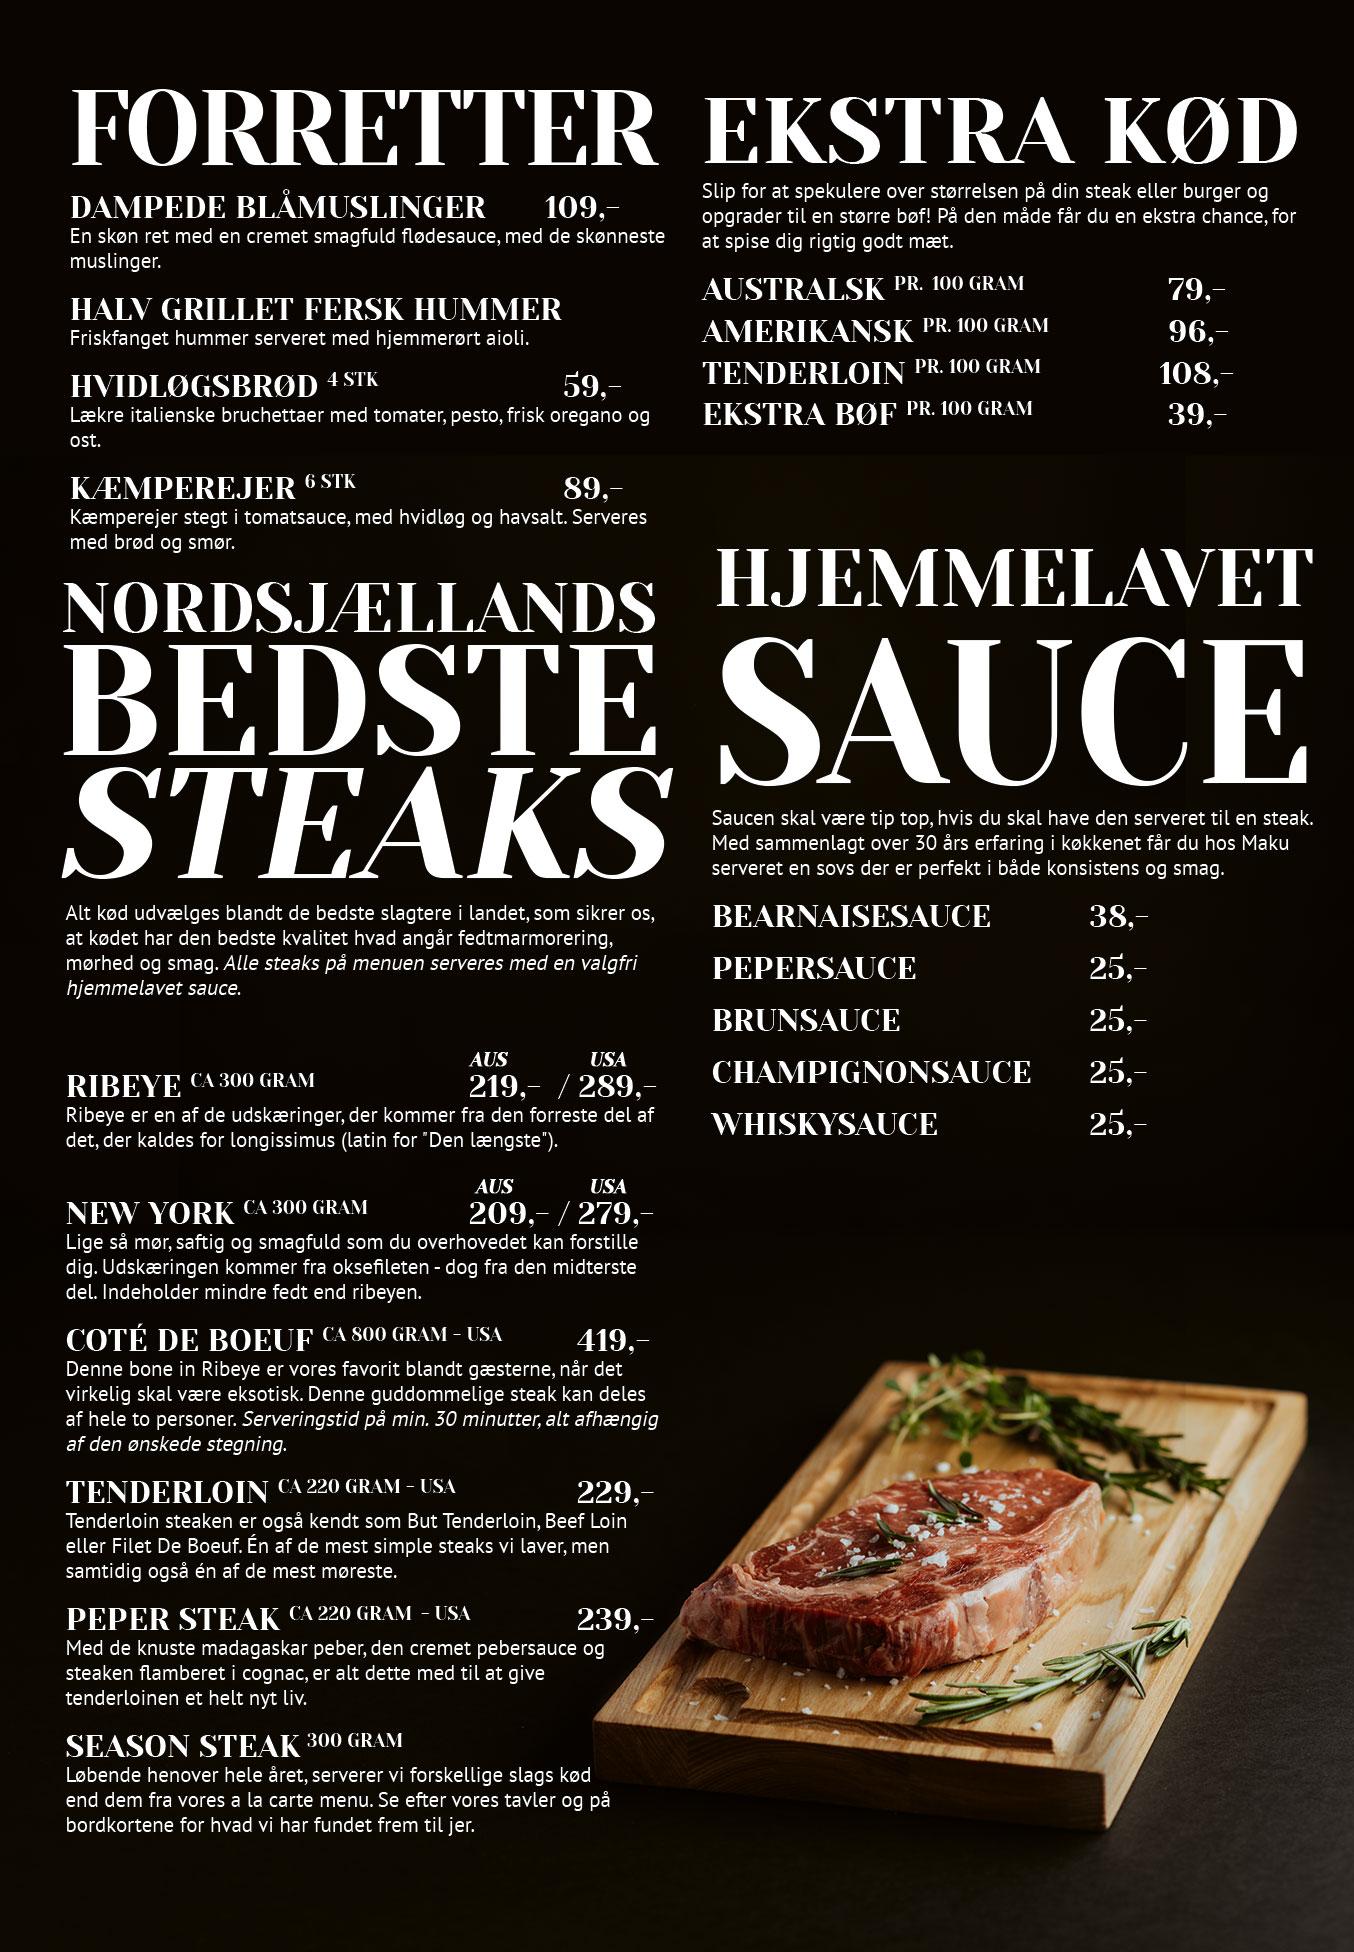 Side 2: Forretter, steaks, sauce